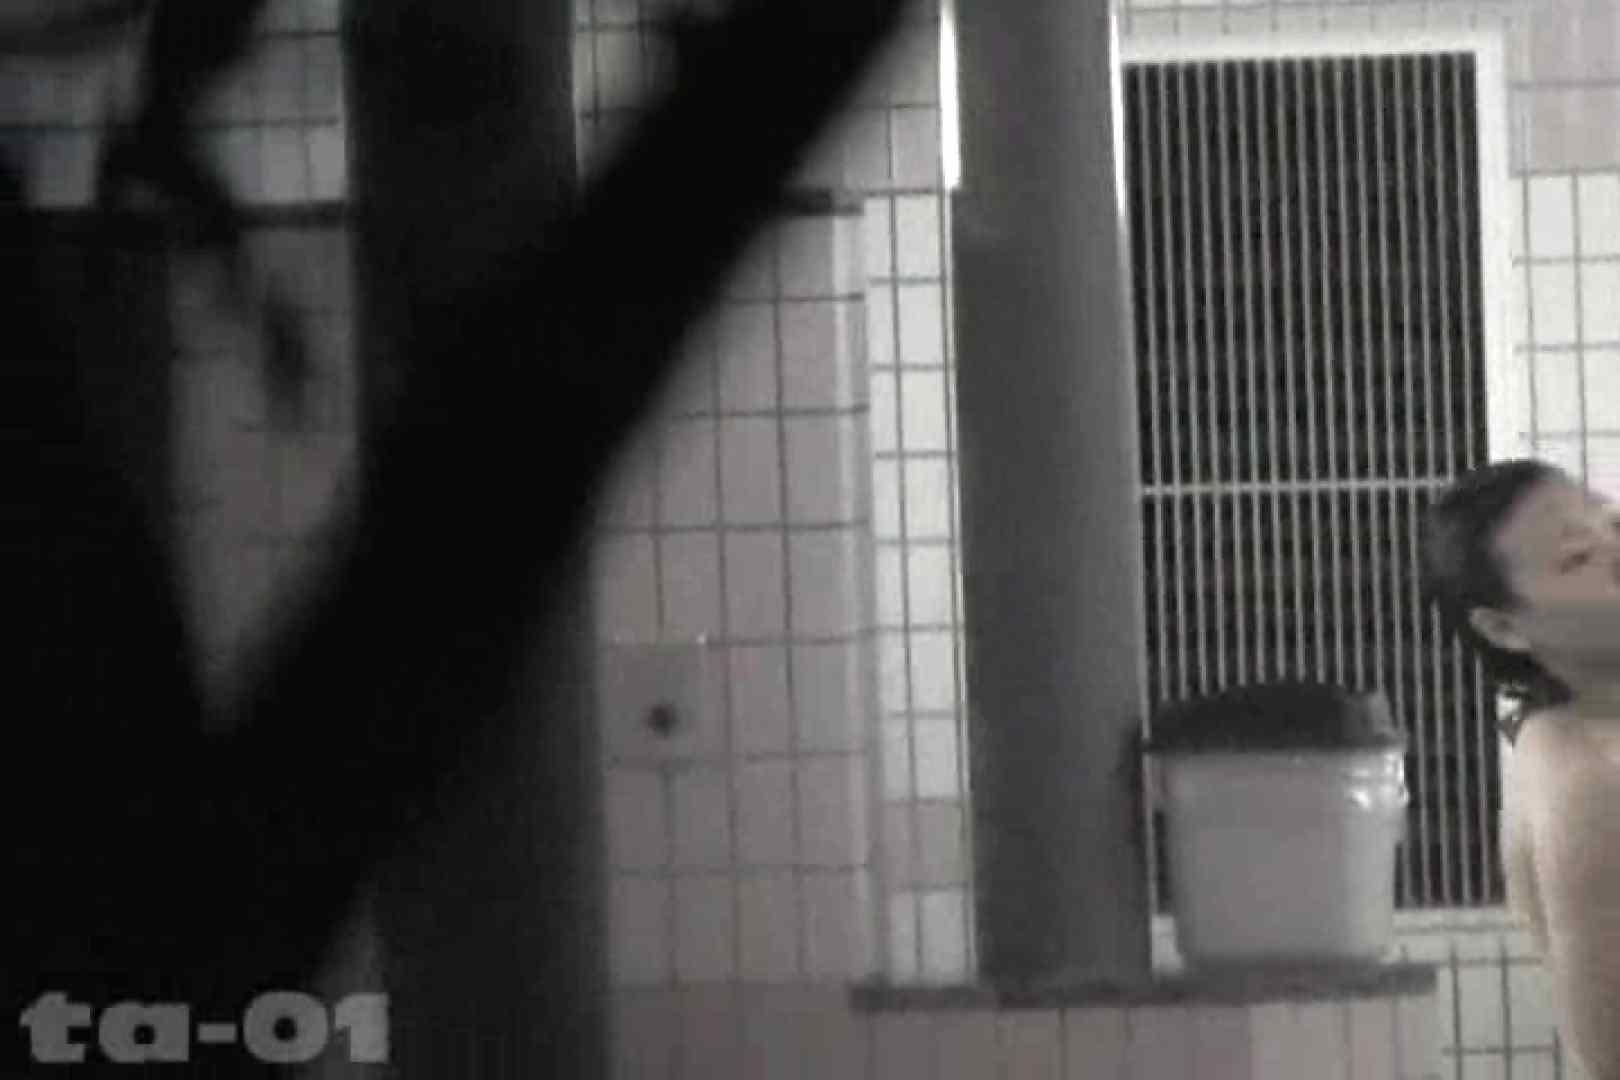 合宿ホテル女風呂盗撮高画質版 Vol.01 高画質動画  106画像 45